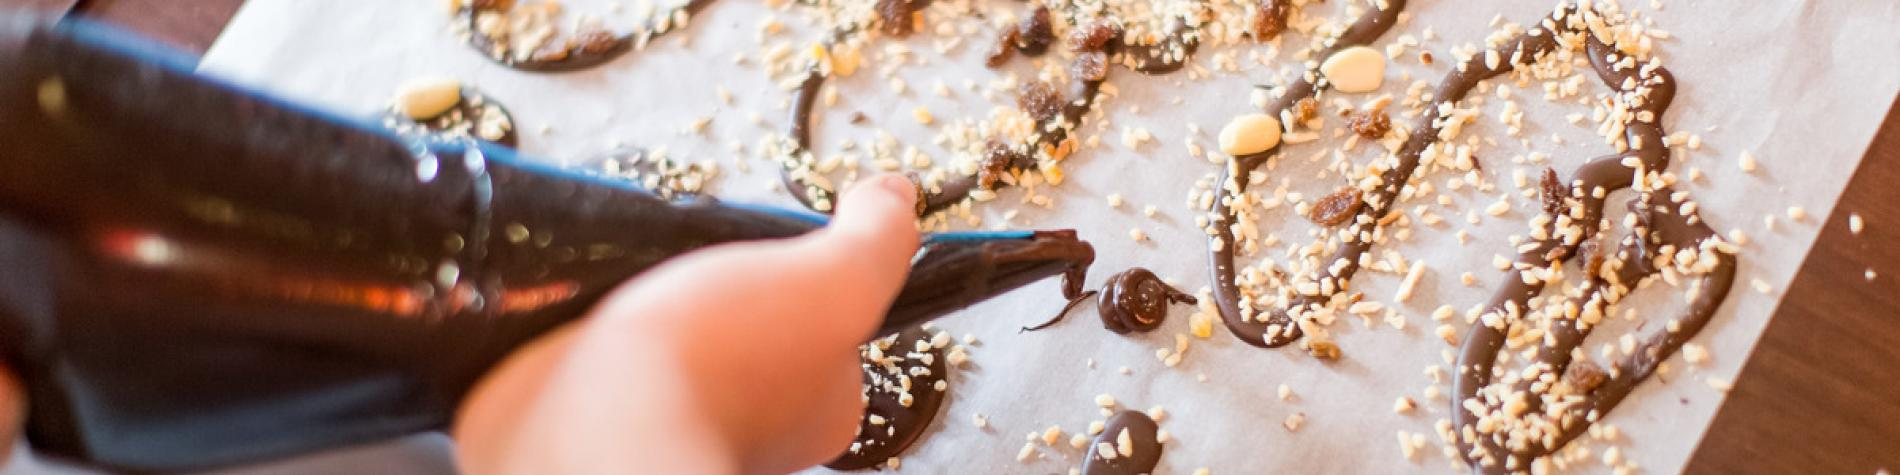 Chocolat Wallonie - Florenville - Les Chocolats d'Edouard